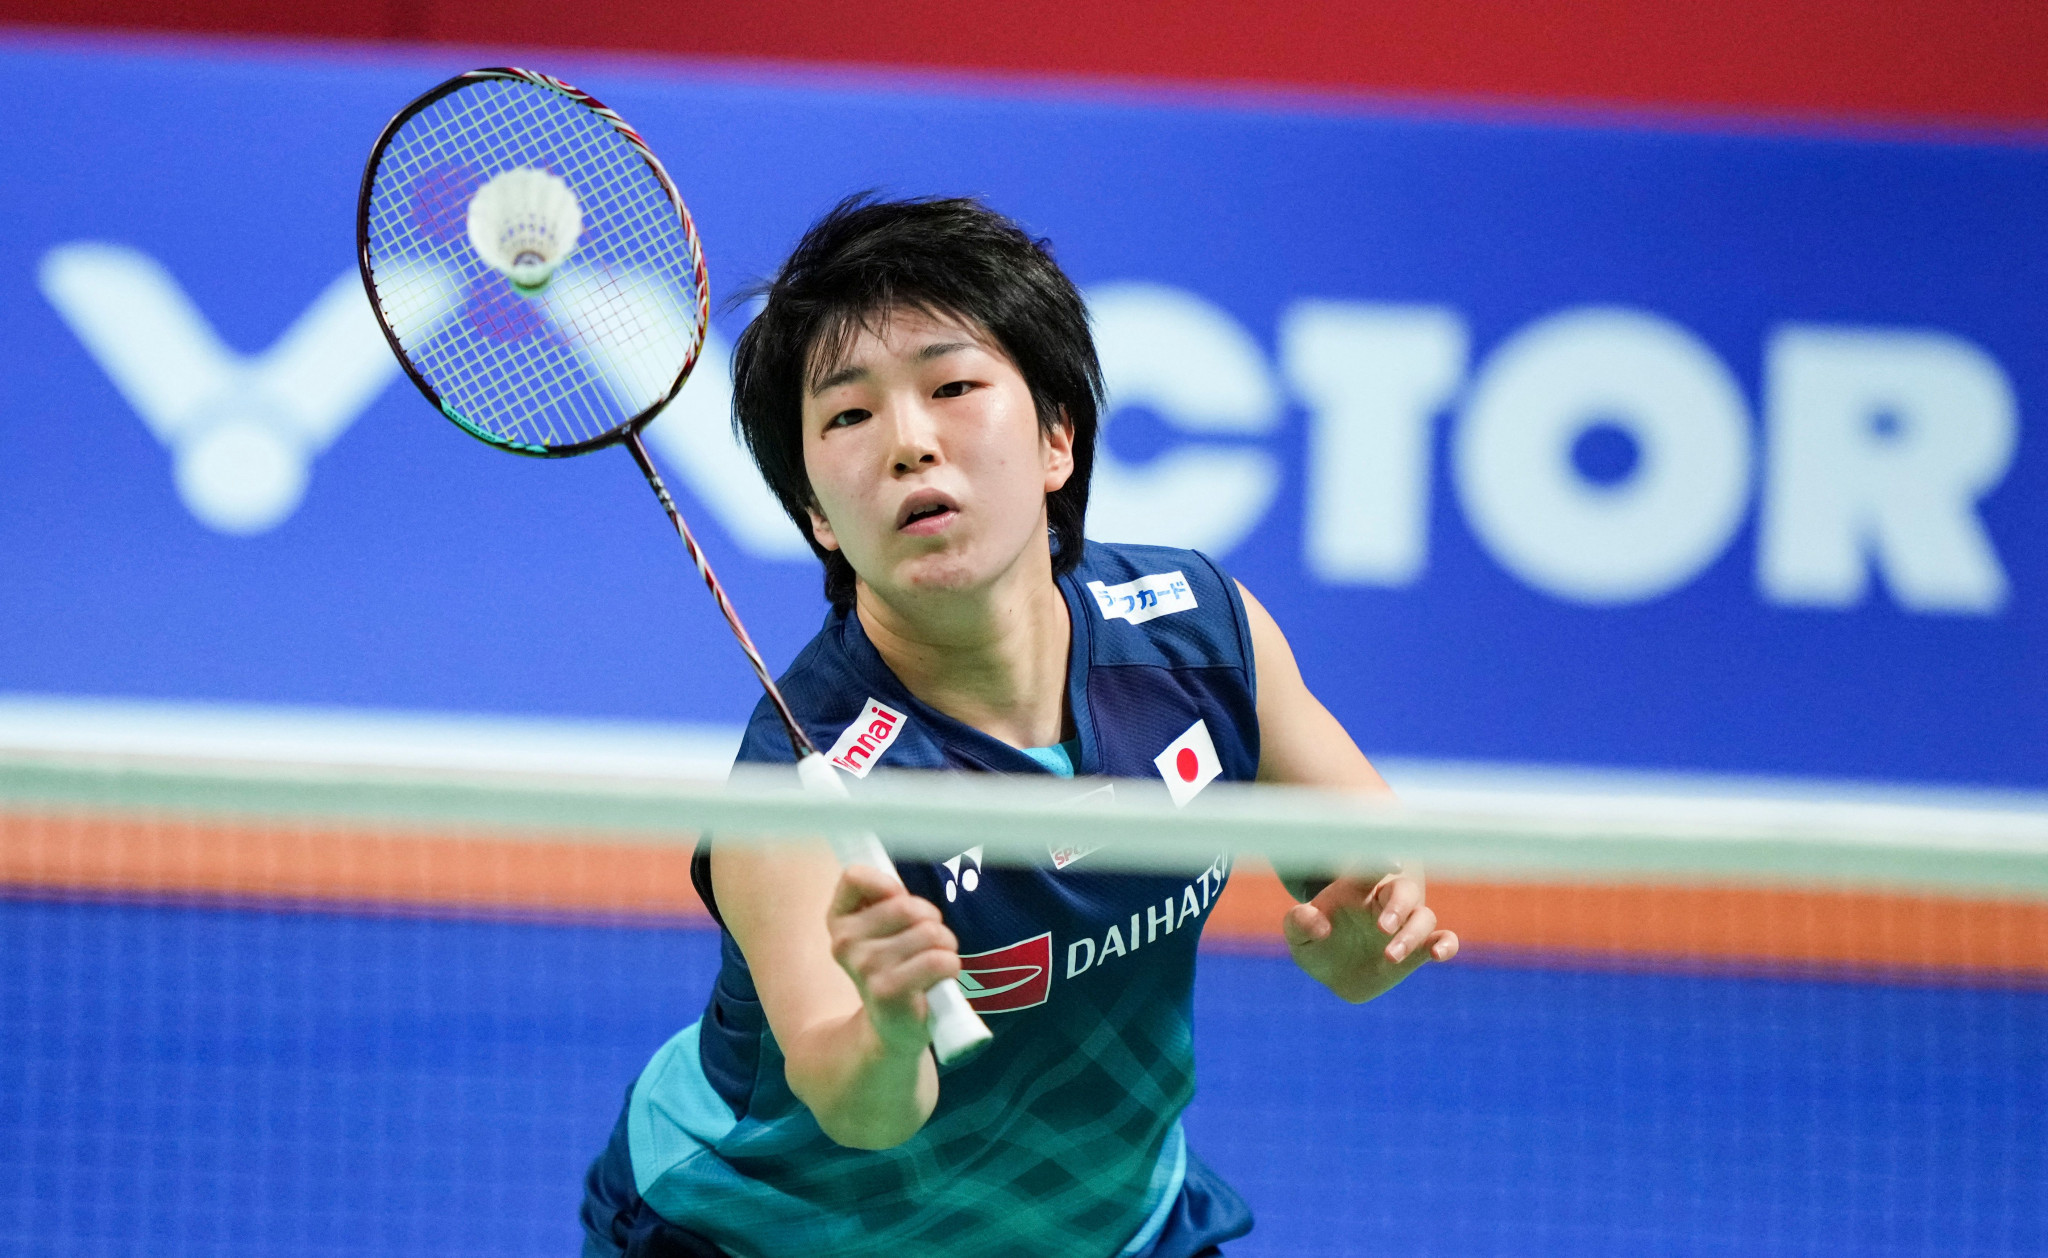 Yamaguchi battles back to reach second round of Denmark Open